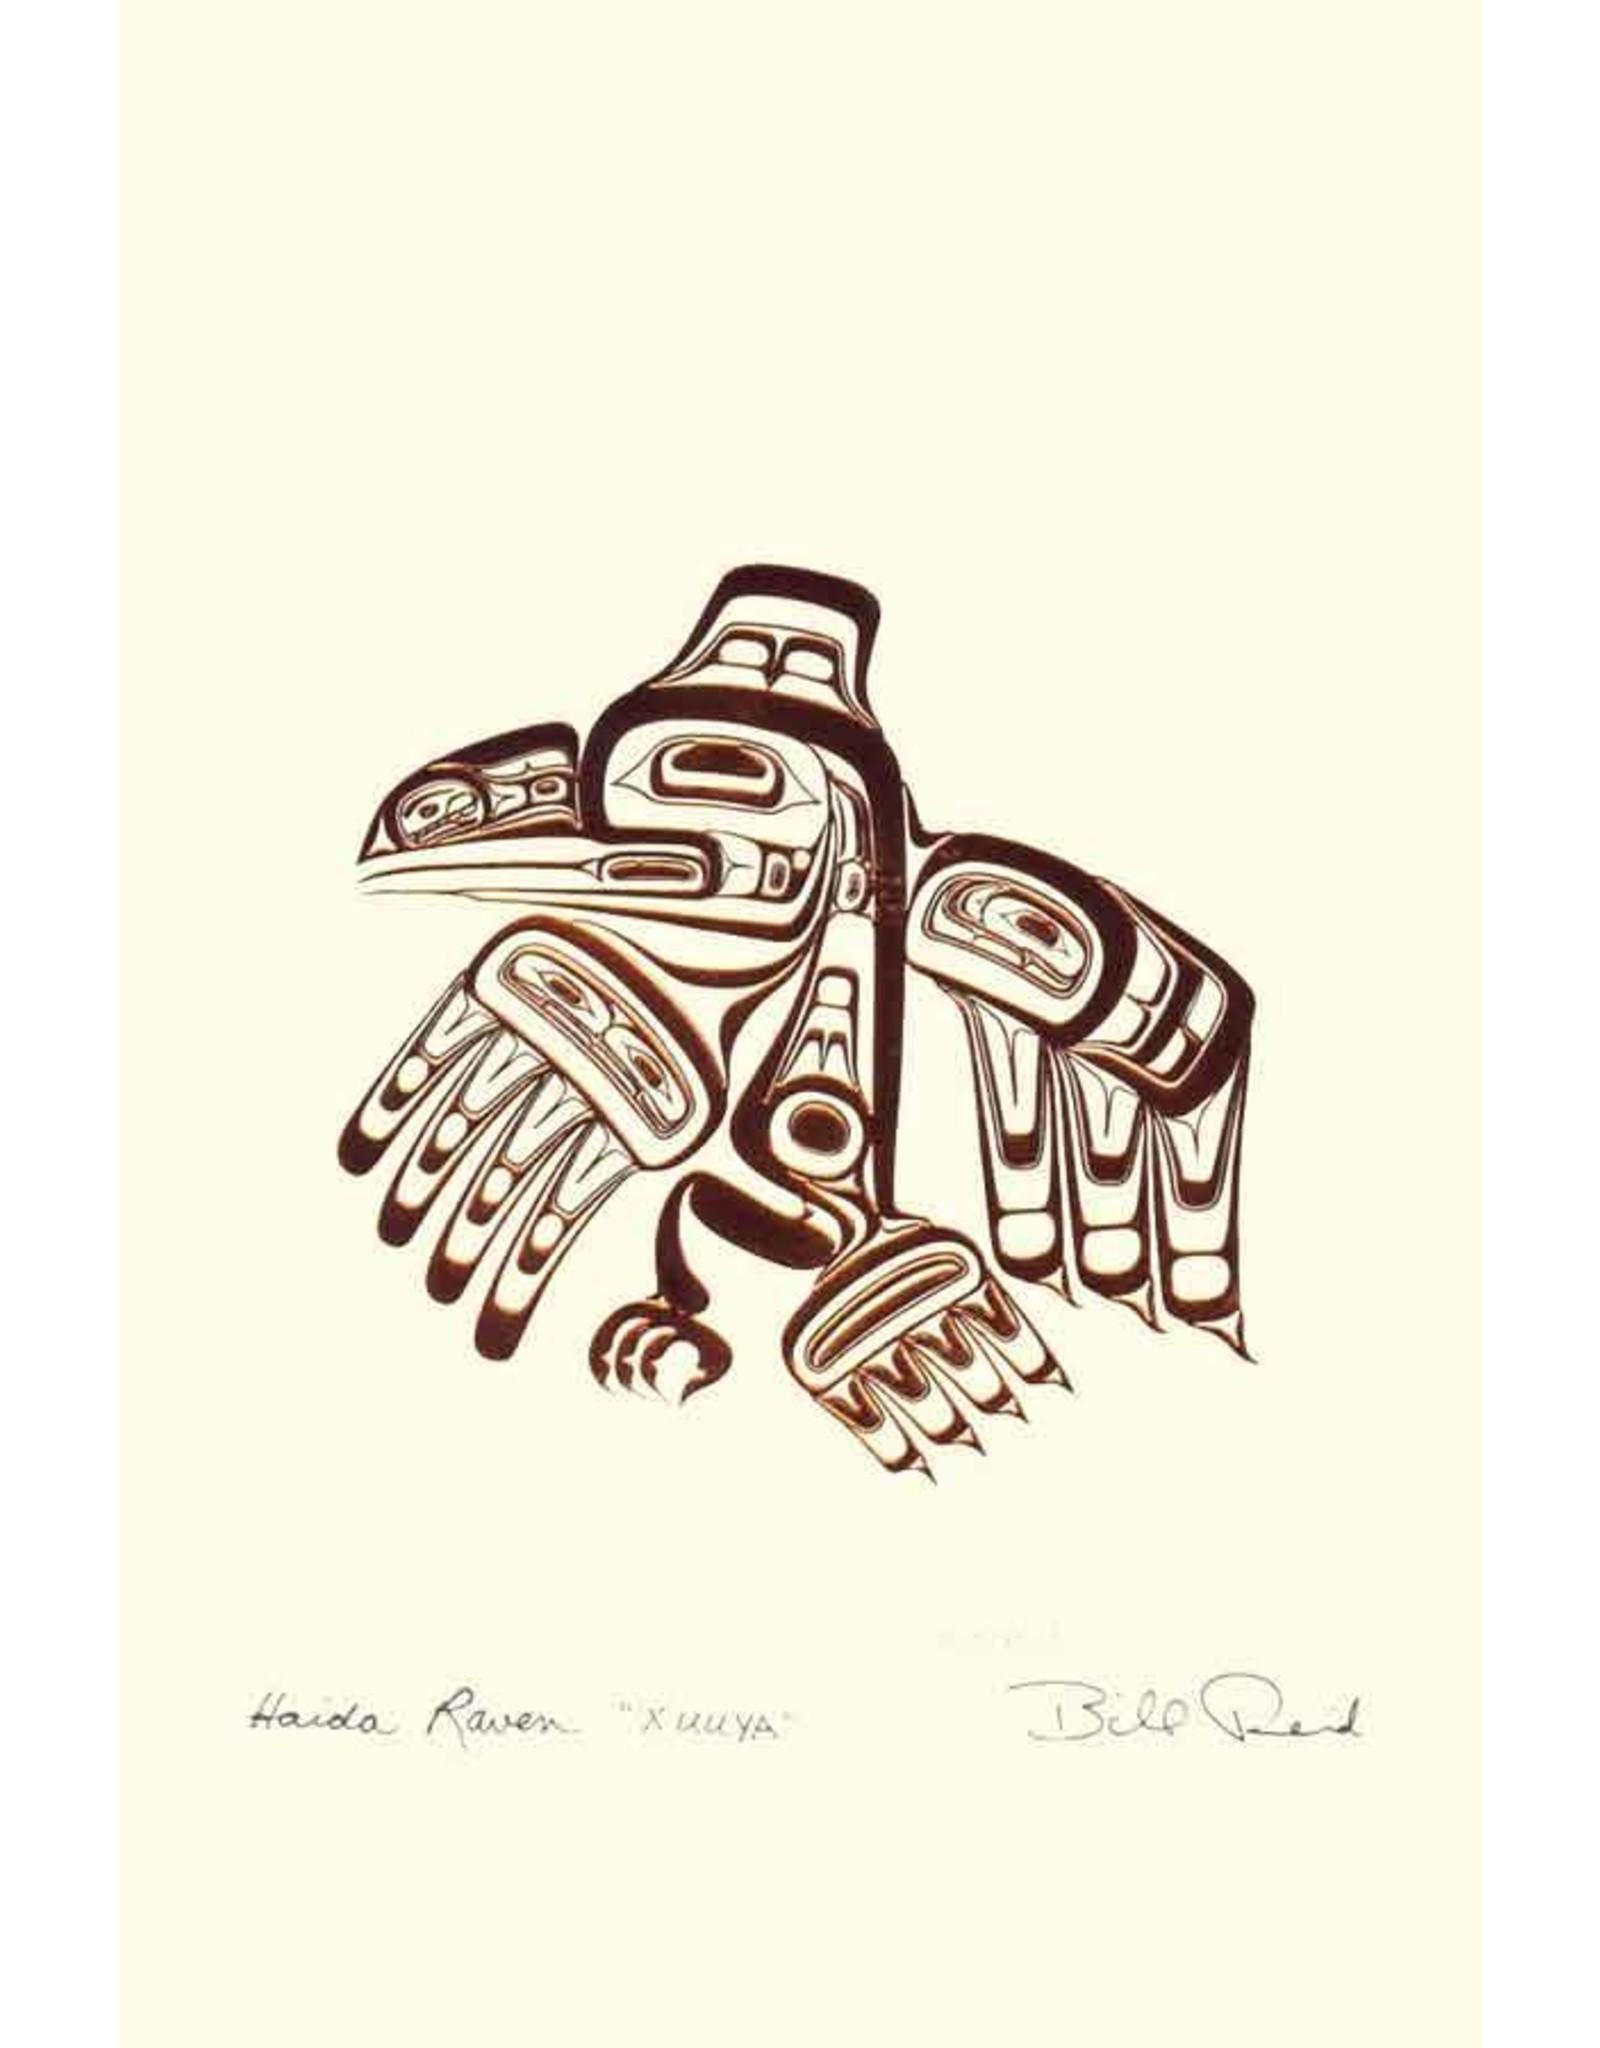 Haida Raven - XUUYA by Bill Reid Card 7438